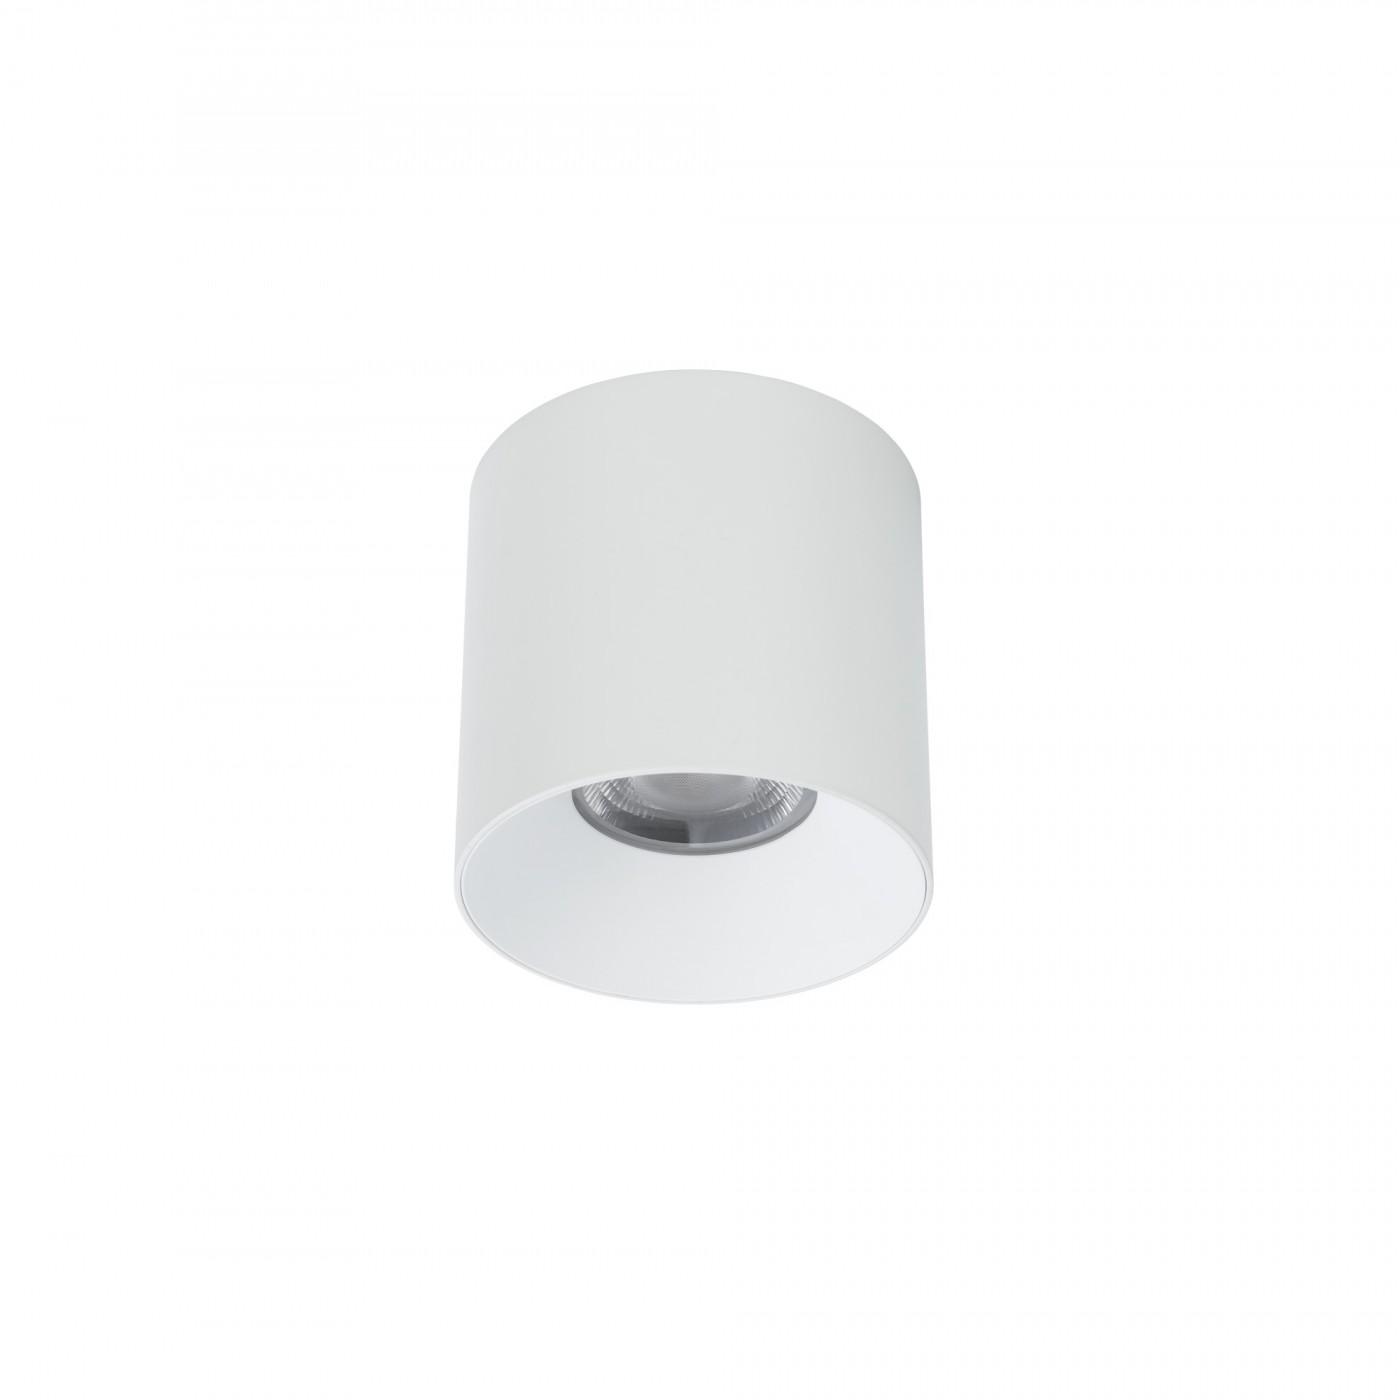 CL IOS LED 30W 3000K white 8731 Nowodvorski Lighting